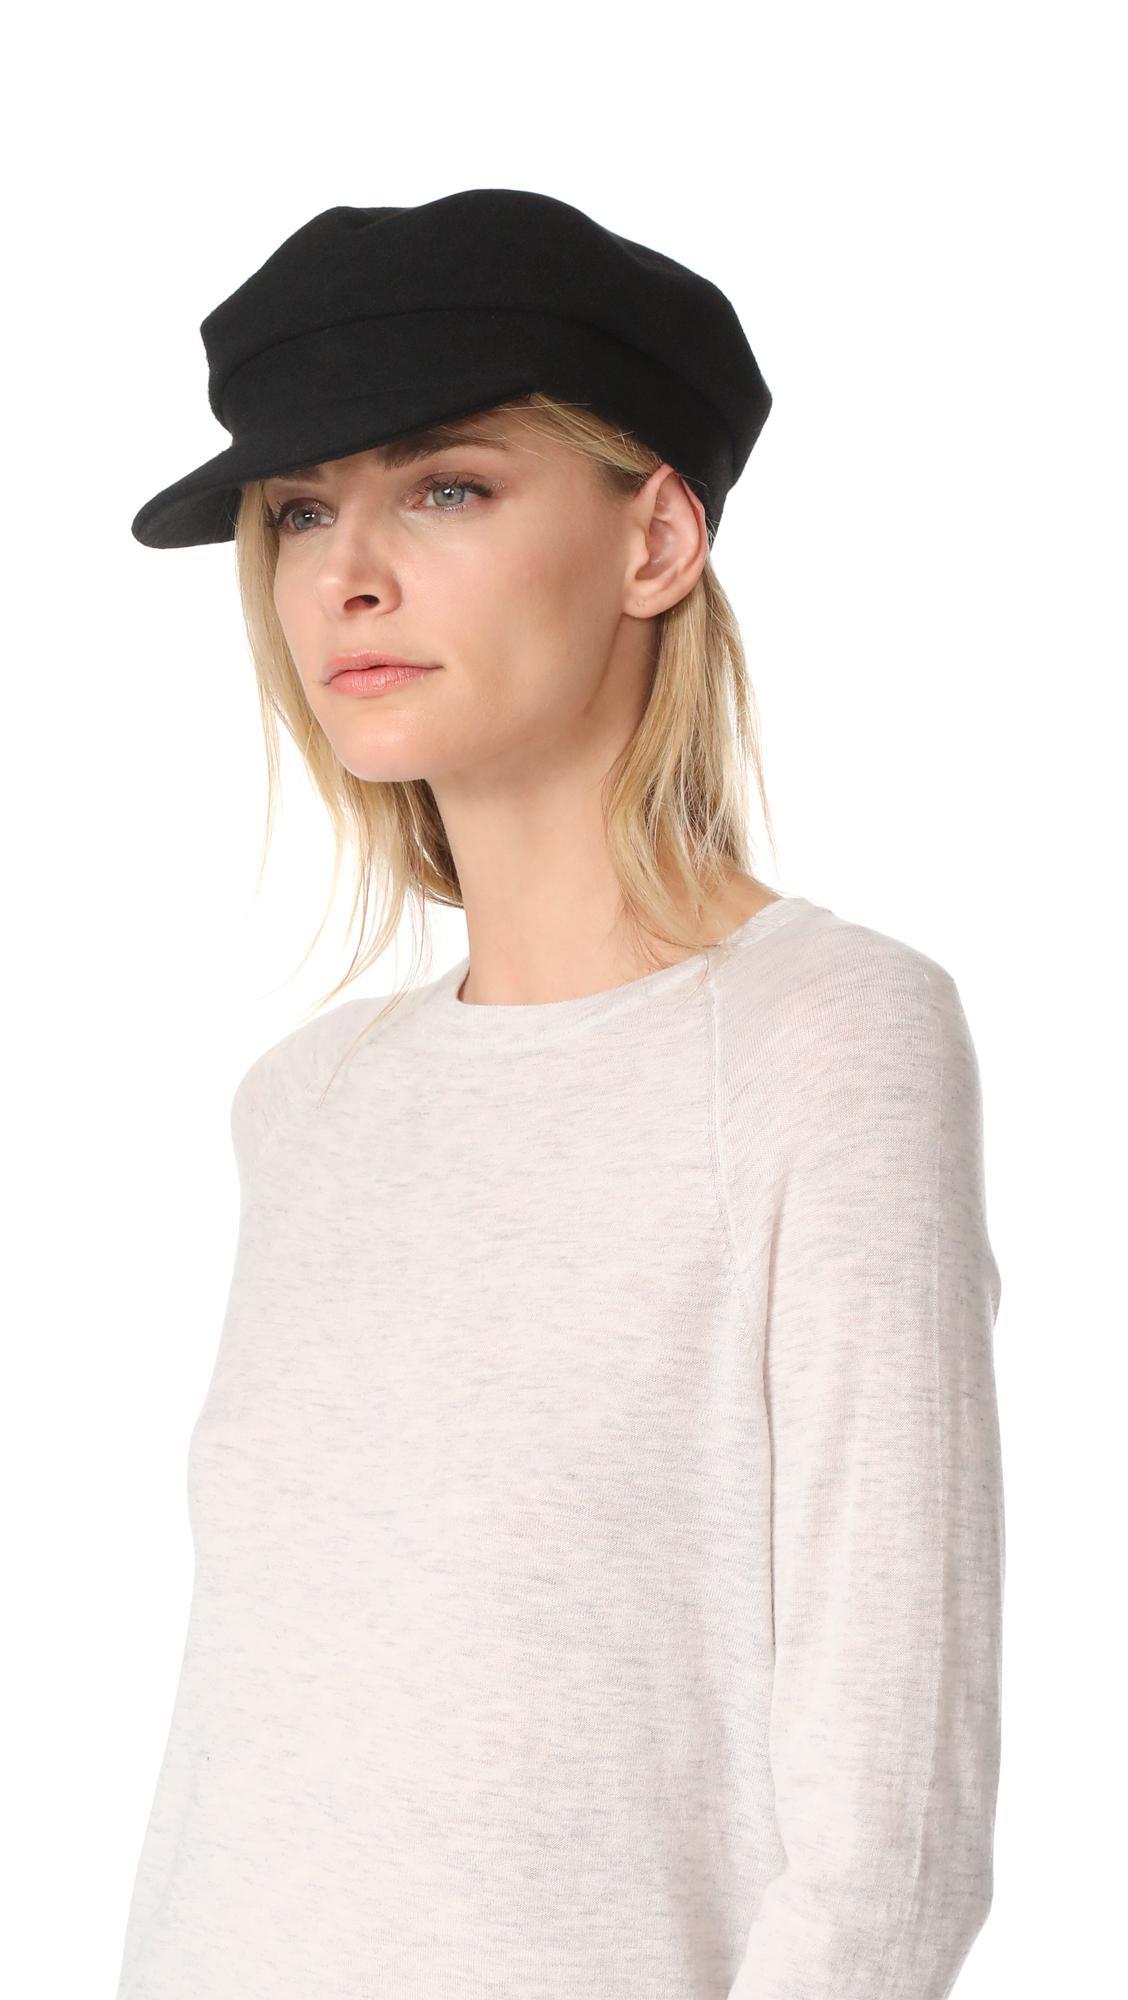 Mattie Hat in Black Janessa Leon oEe2v